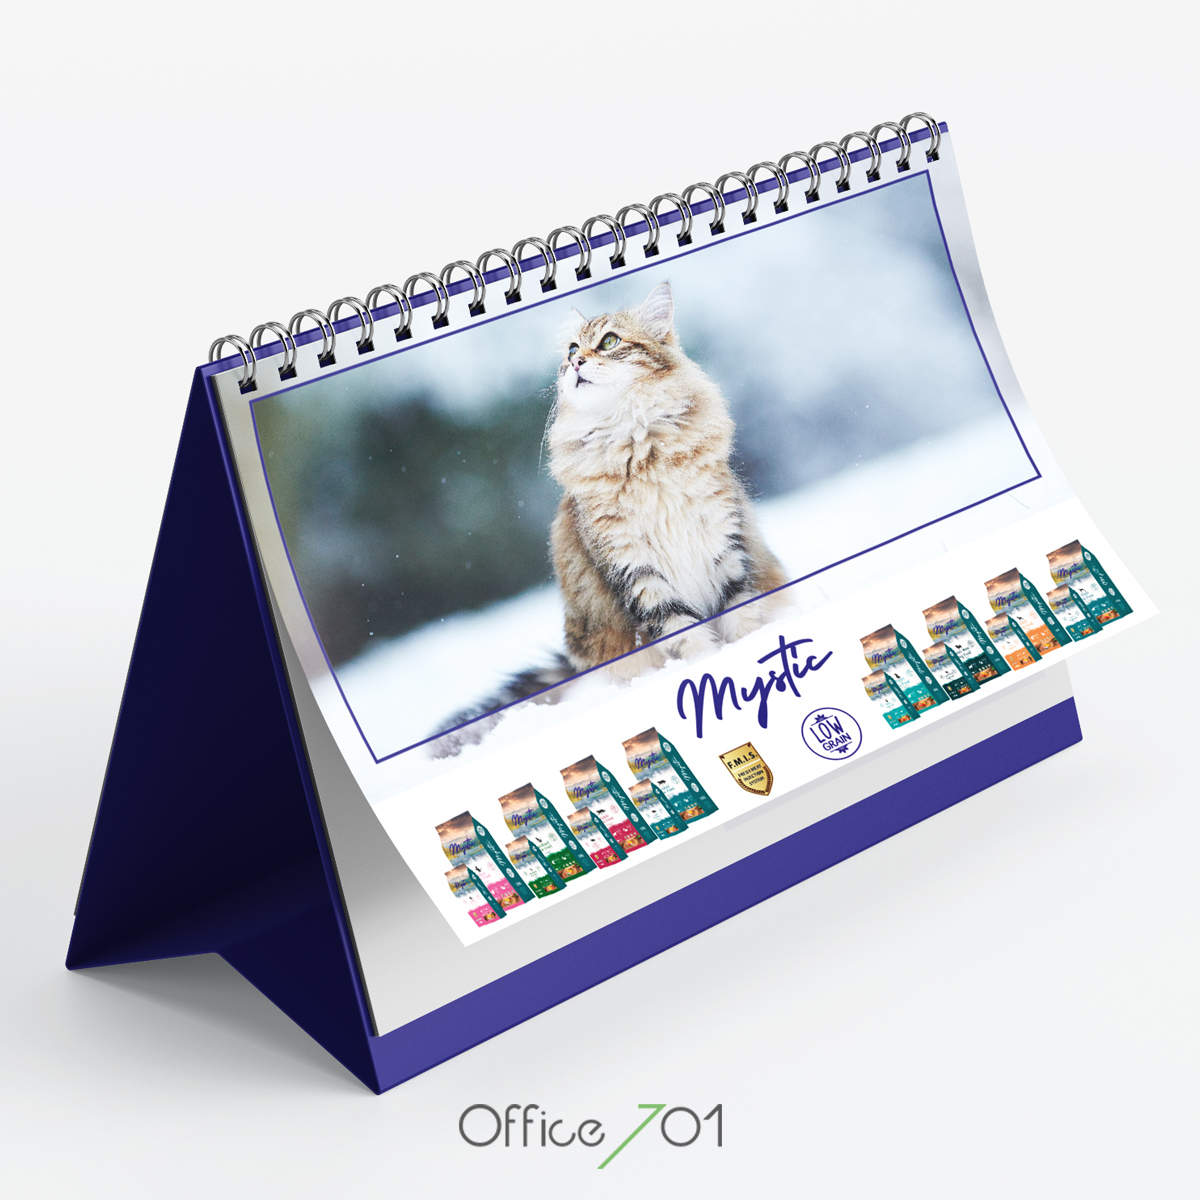 Office701   Mysticpetfood Takvim Tasarımı